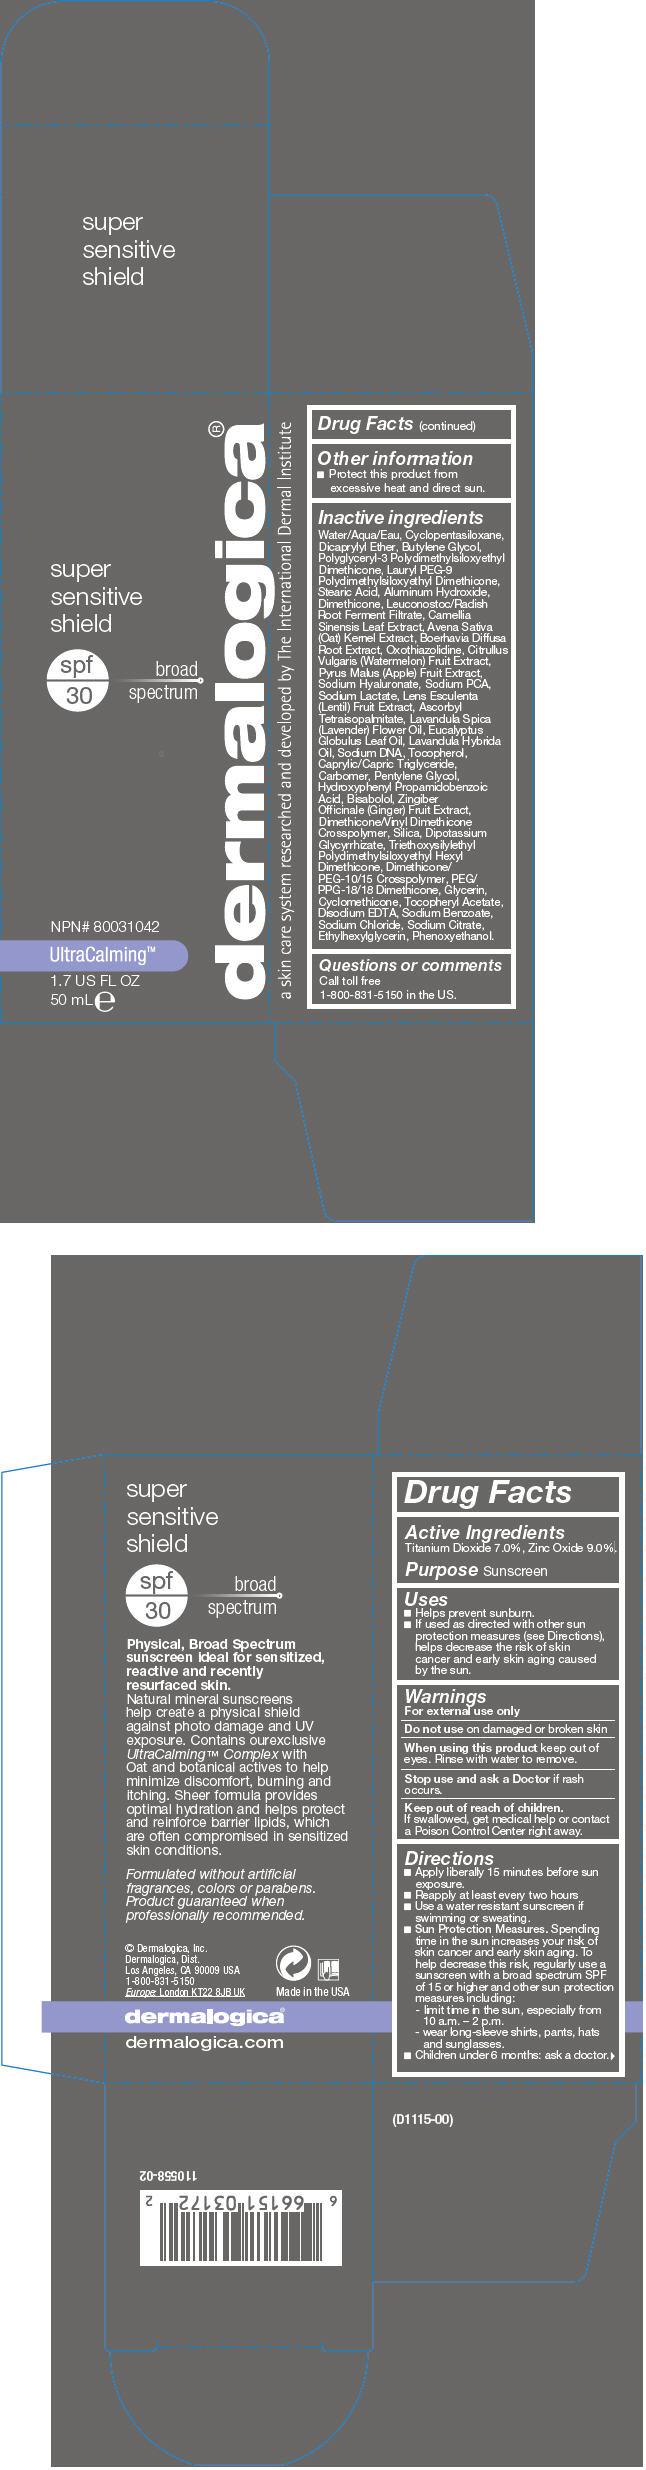 Super Sensitive Shield Spf 30 (Titanium Dioxide And Zinc Oxide) Lotion [Dermalogica, Inc.]